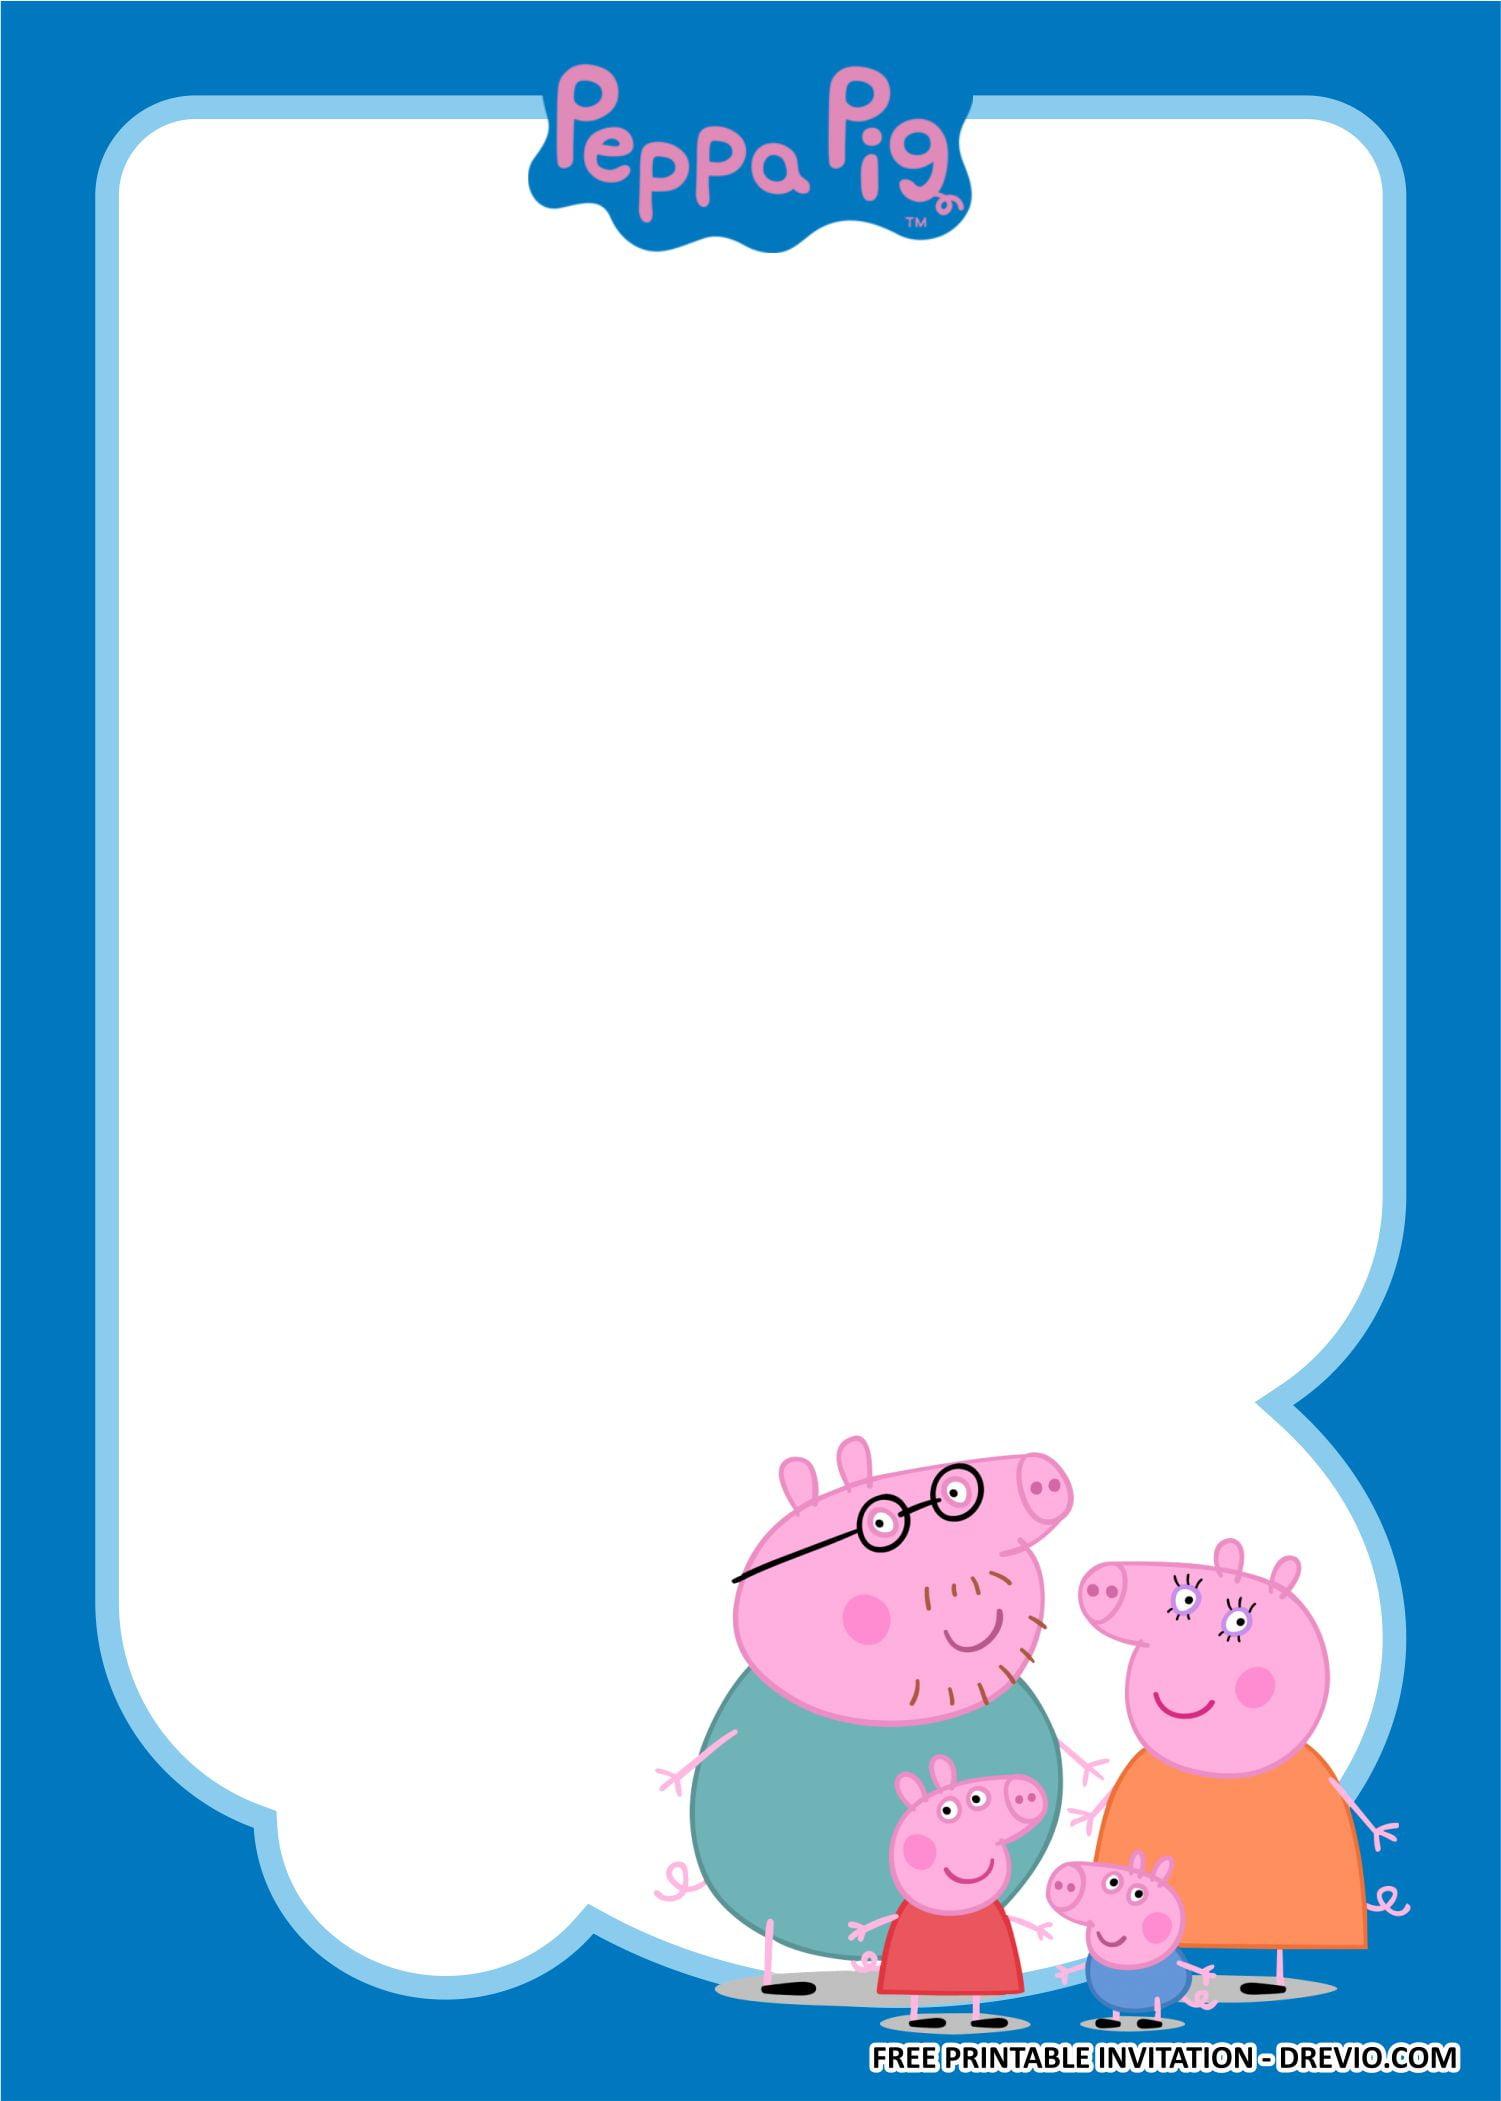 peppa pig birthday party kits templates